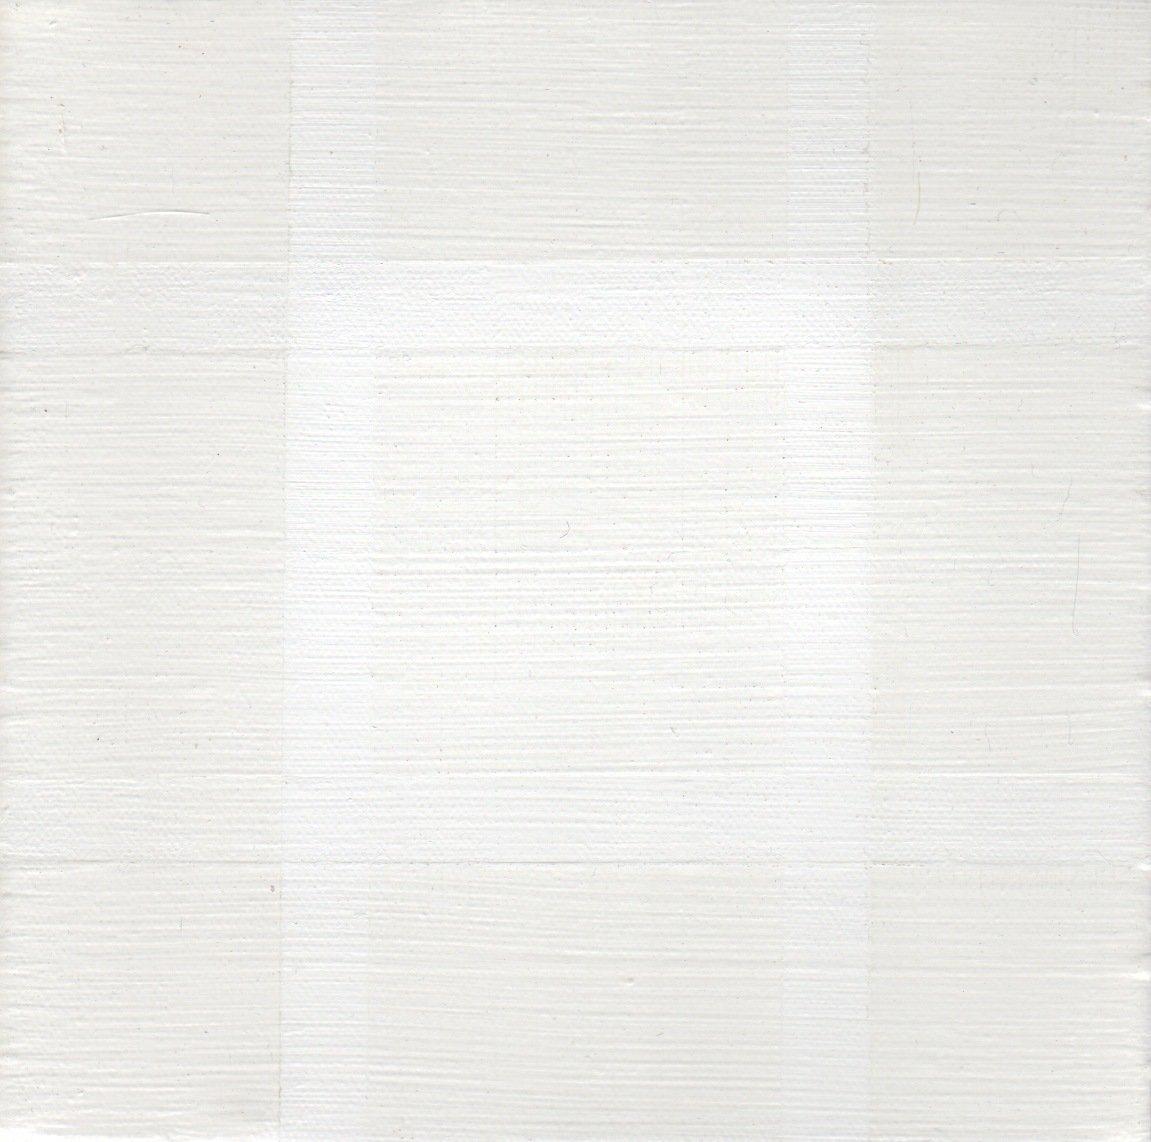 Polyphon/weiß/Polyphon/white 04